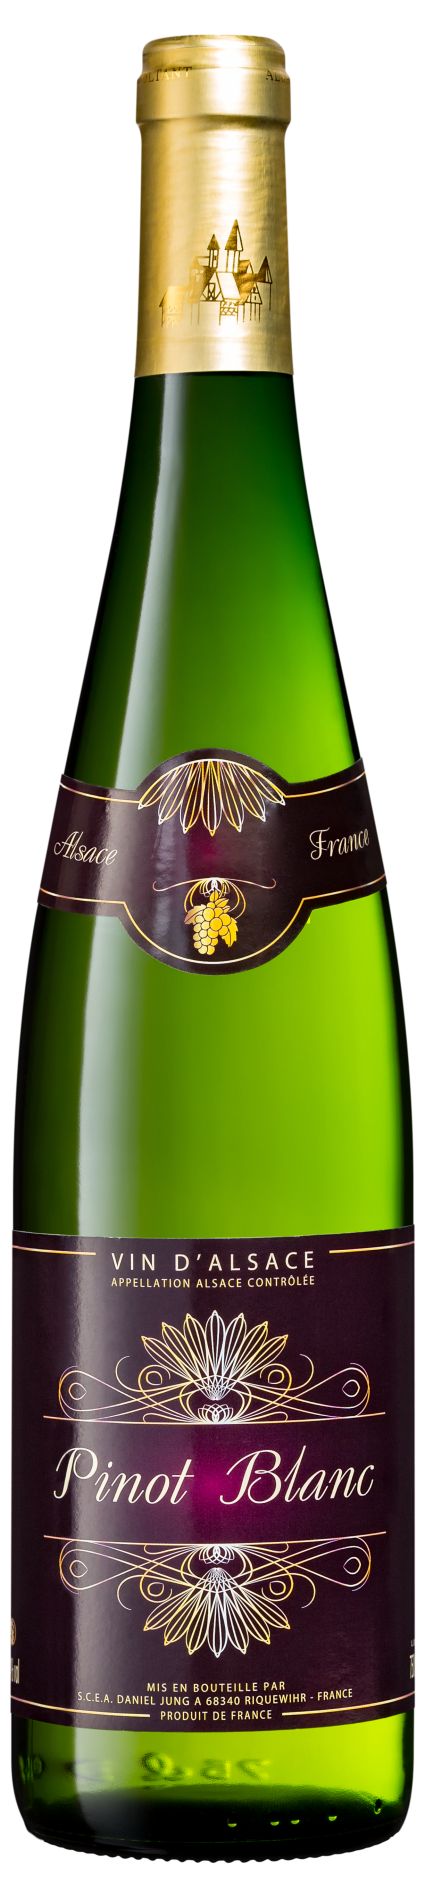 Pinot blanc - vin d'Alsace